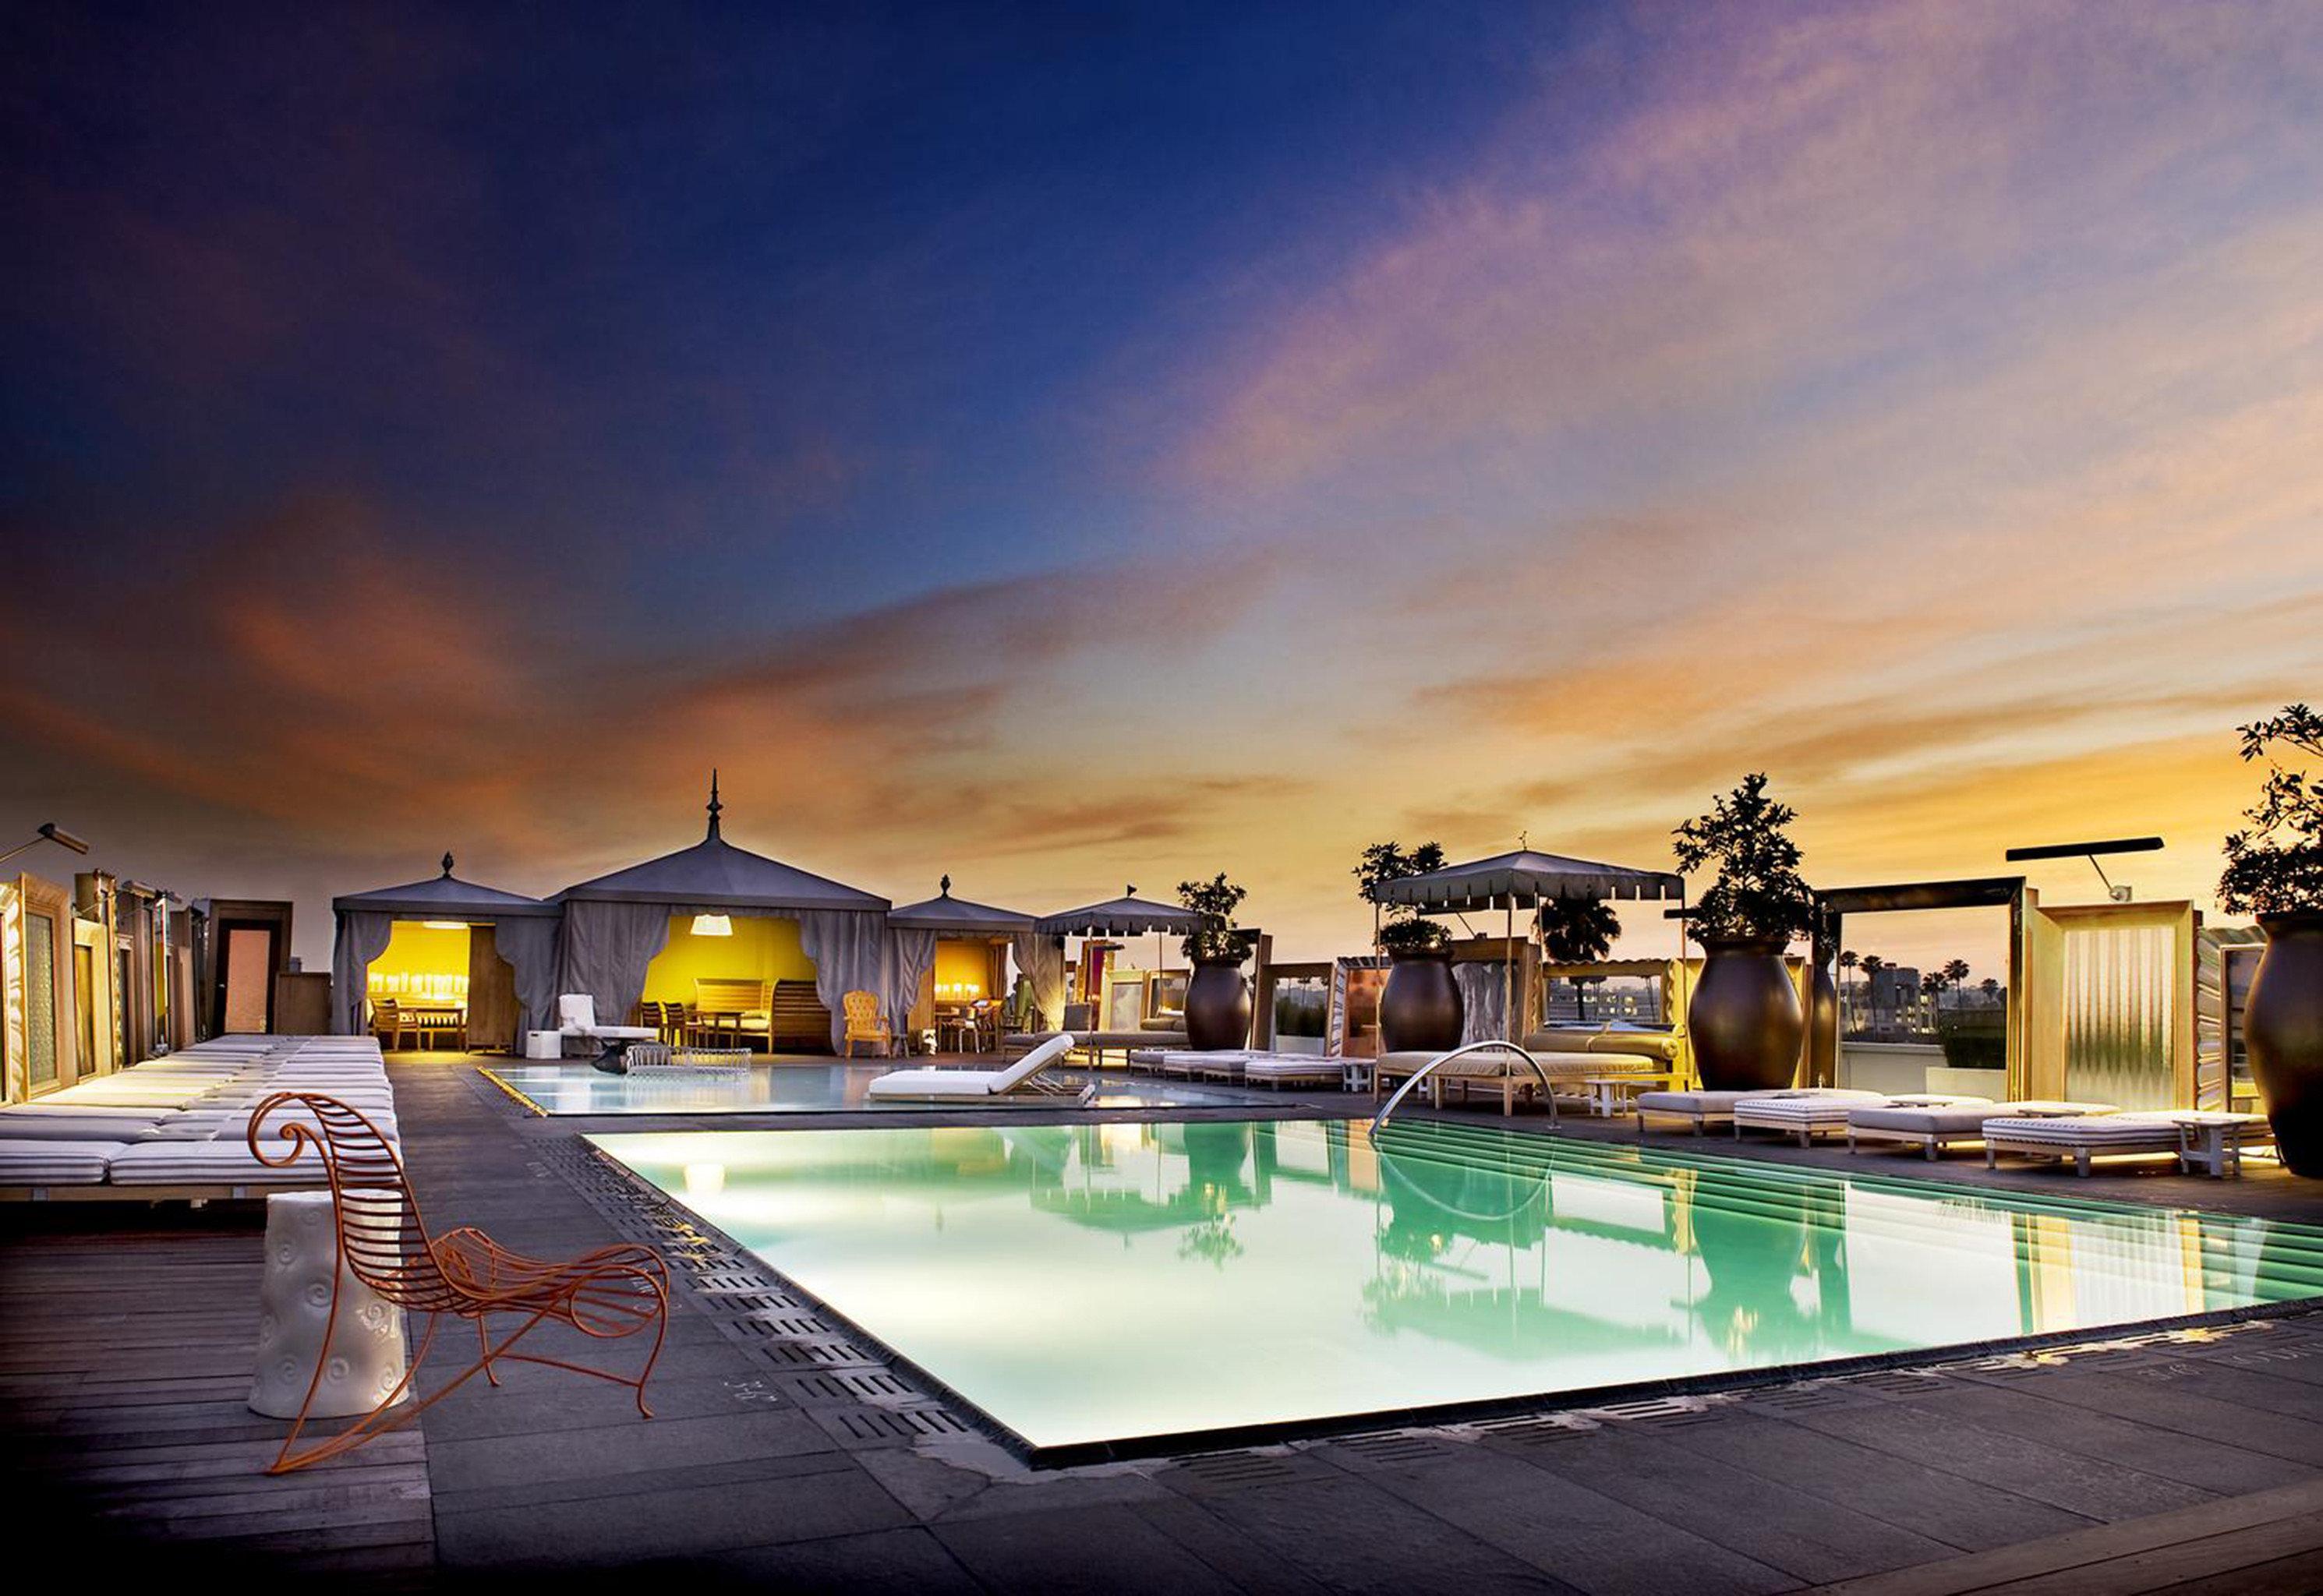 City Elegant Modern Outdoors Patio Pool Sunset sky swimming pool night evening Resort dusk cityscape